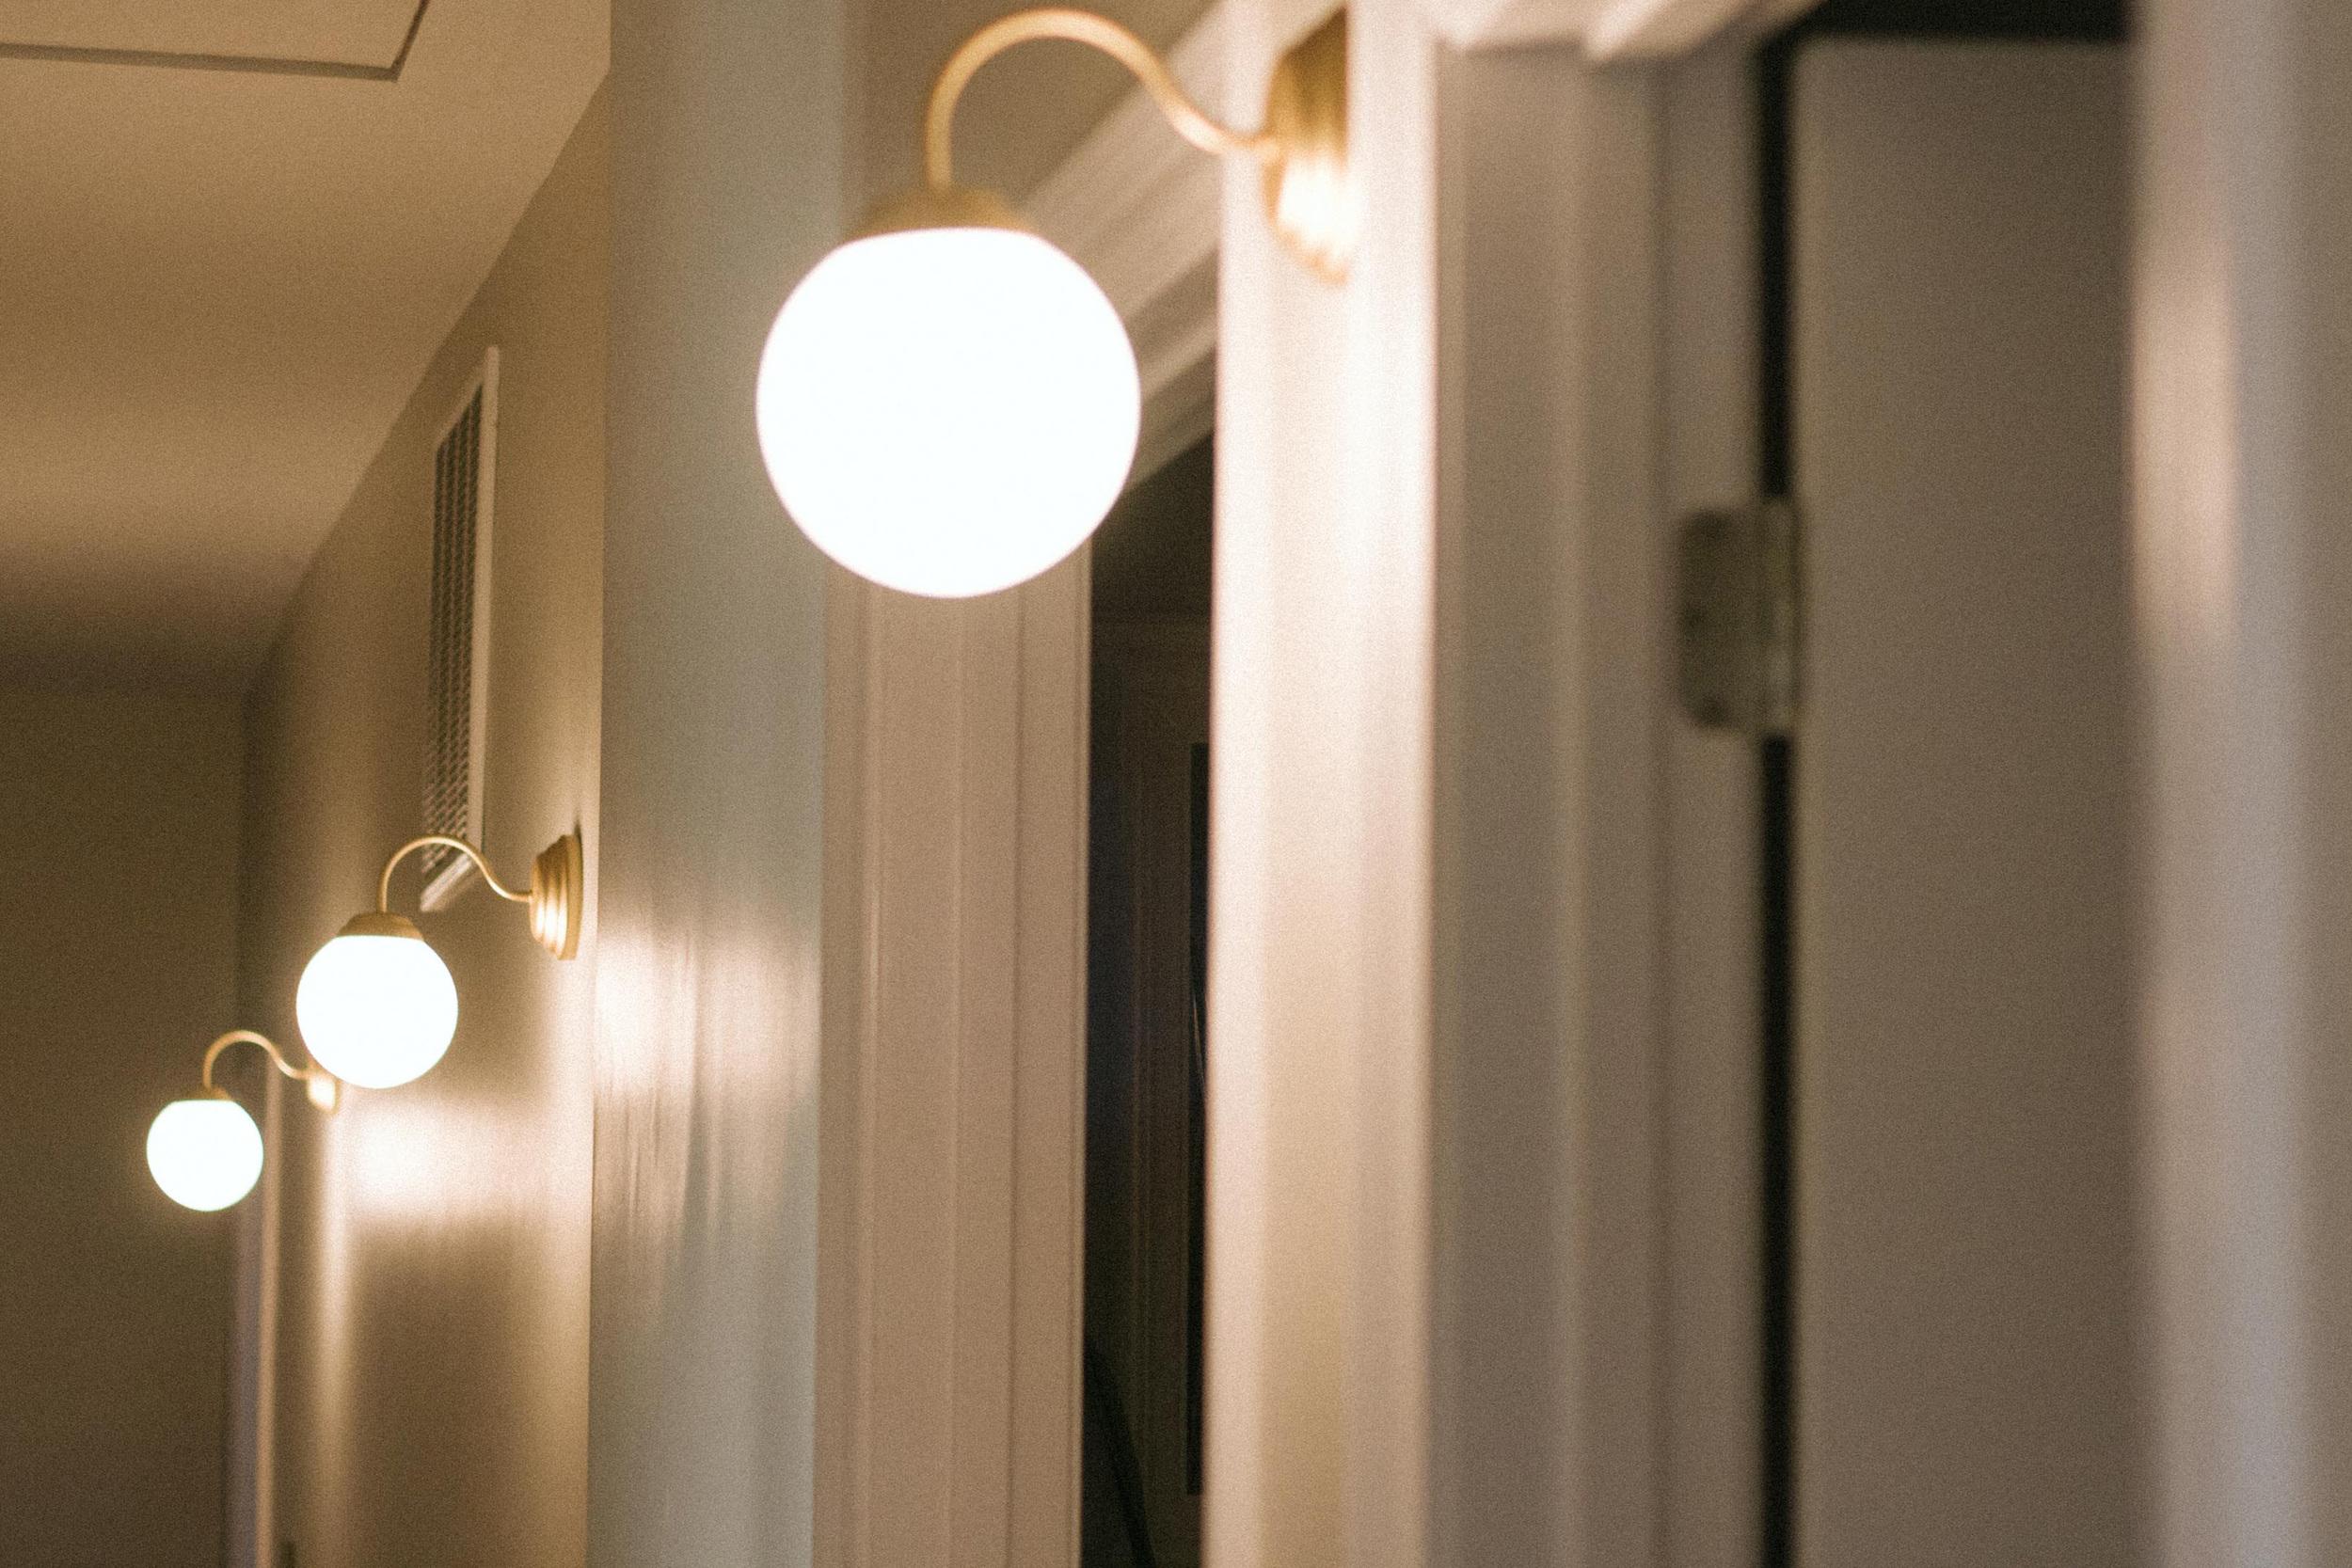 BEFORE + AFTER •HALLWAY LIGHTING • IKEA LILLHOLMEN SCONCE